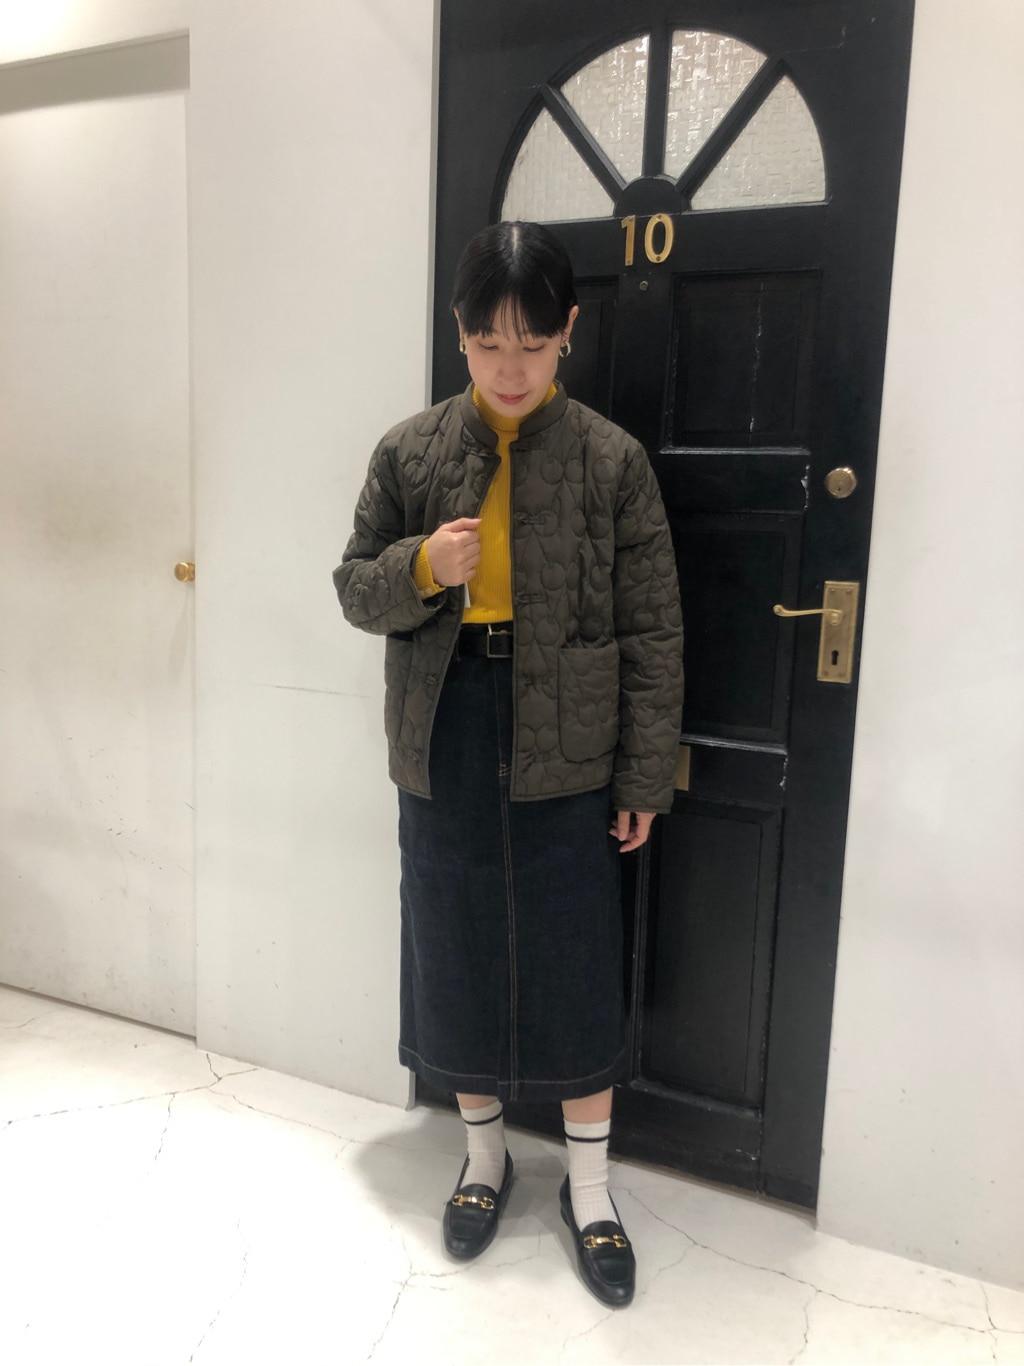 Dot and Stripes CHILD WOMAN ルクアイーレ 身長:151cm 2020.11.27